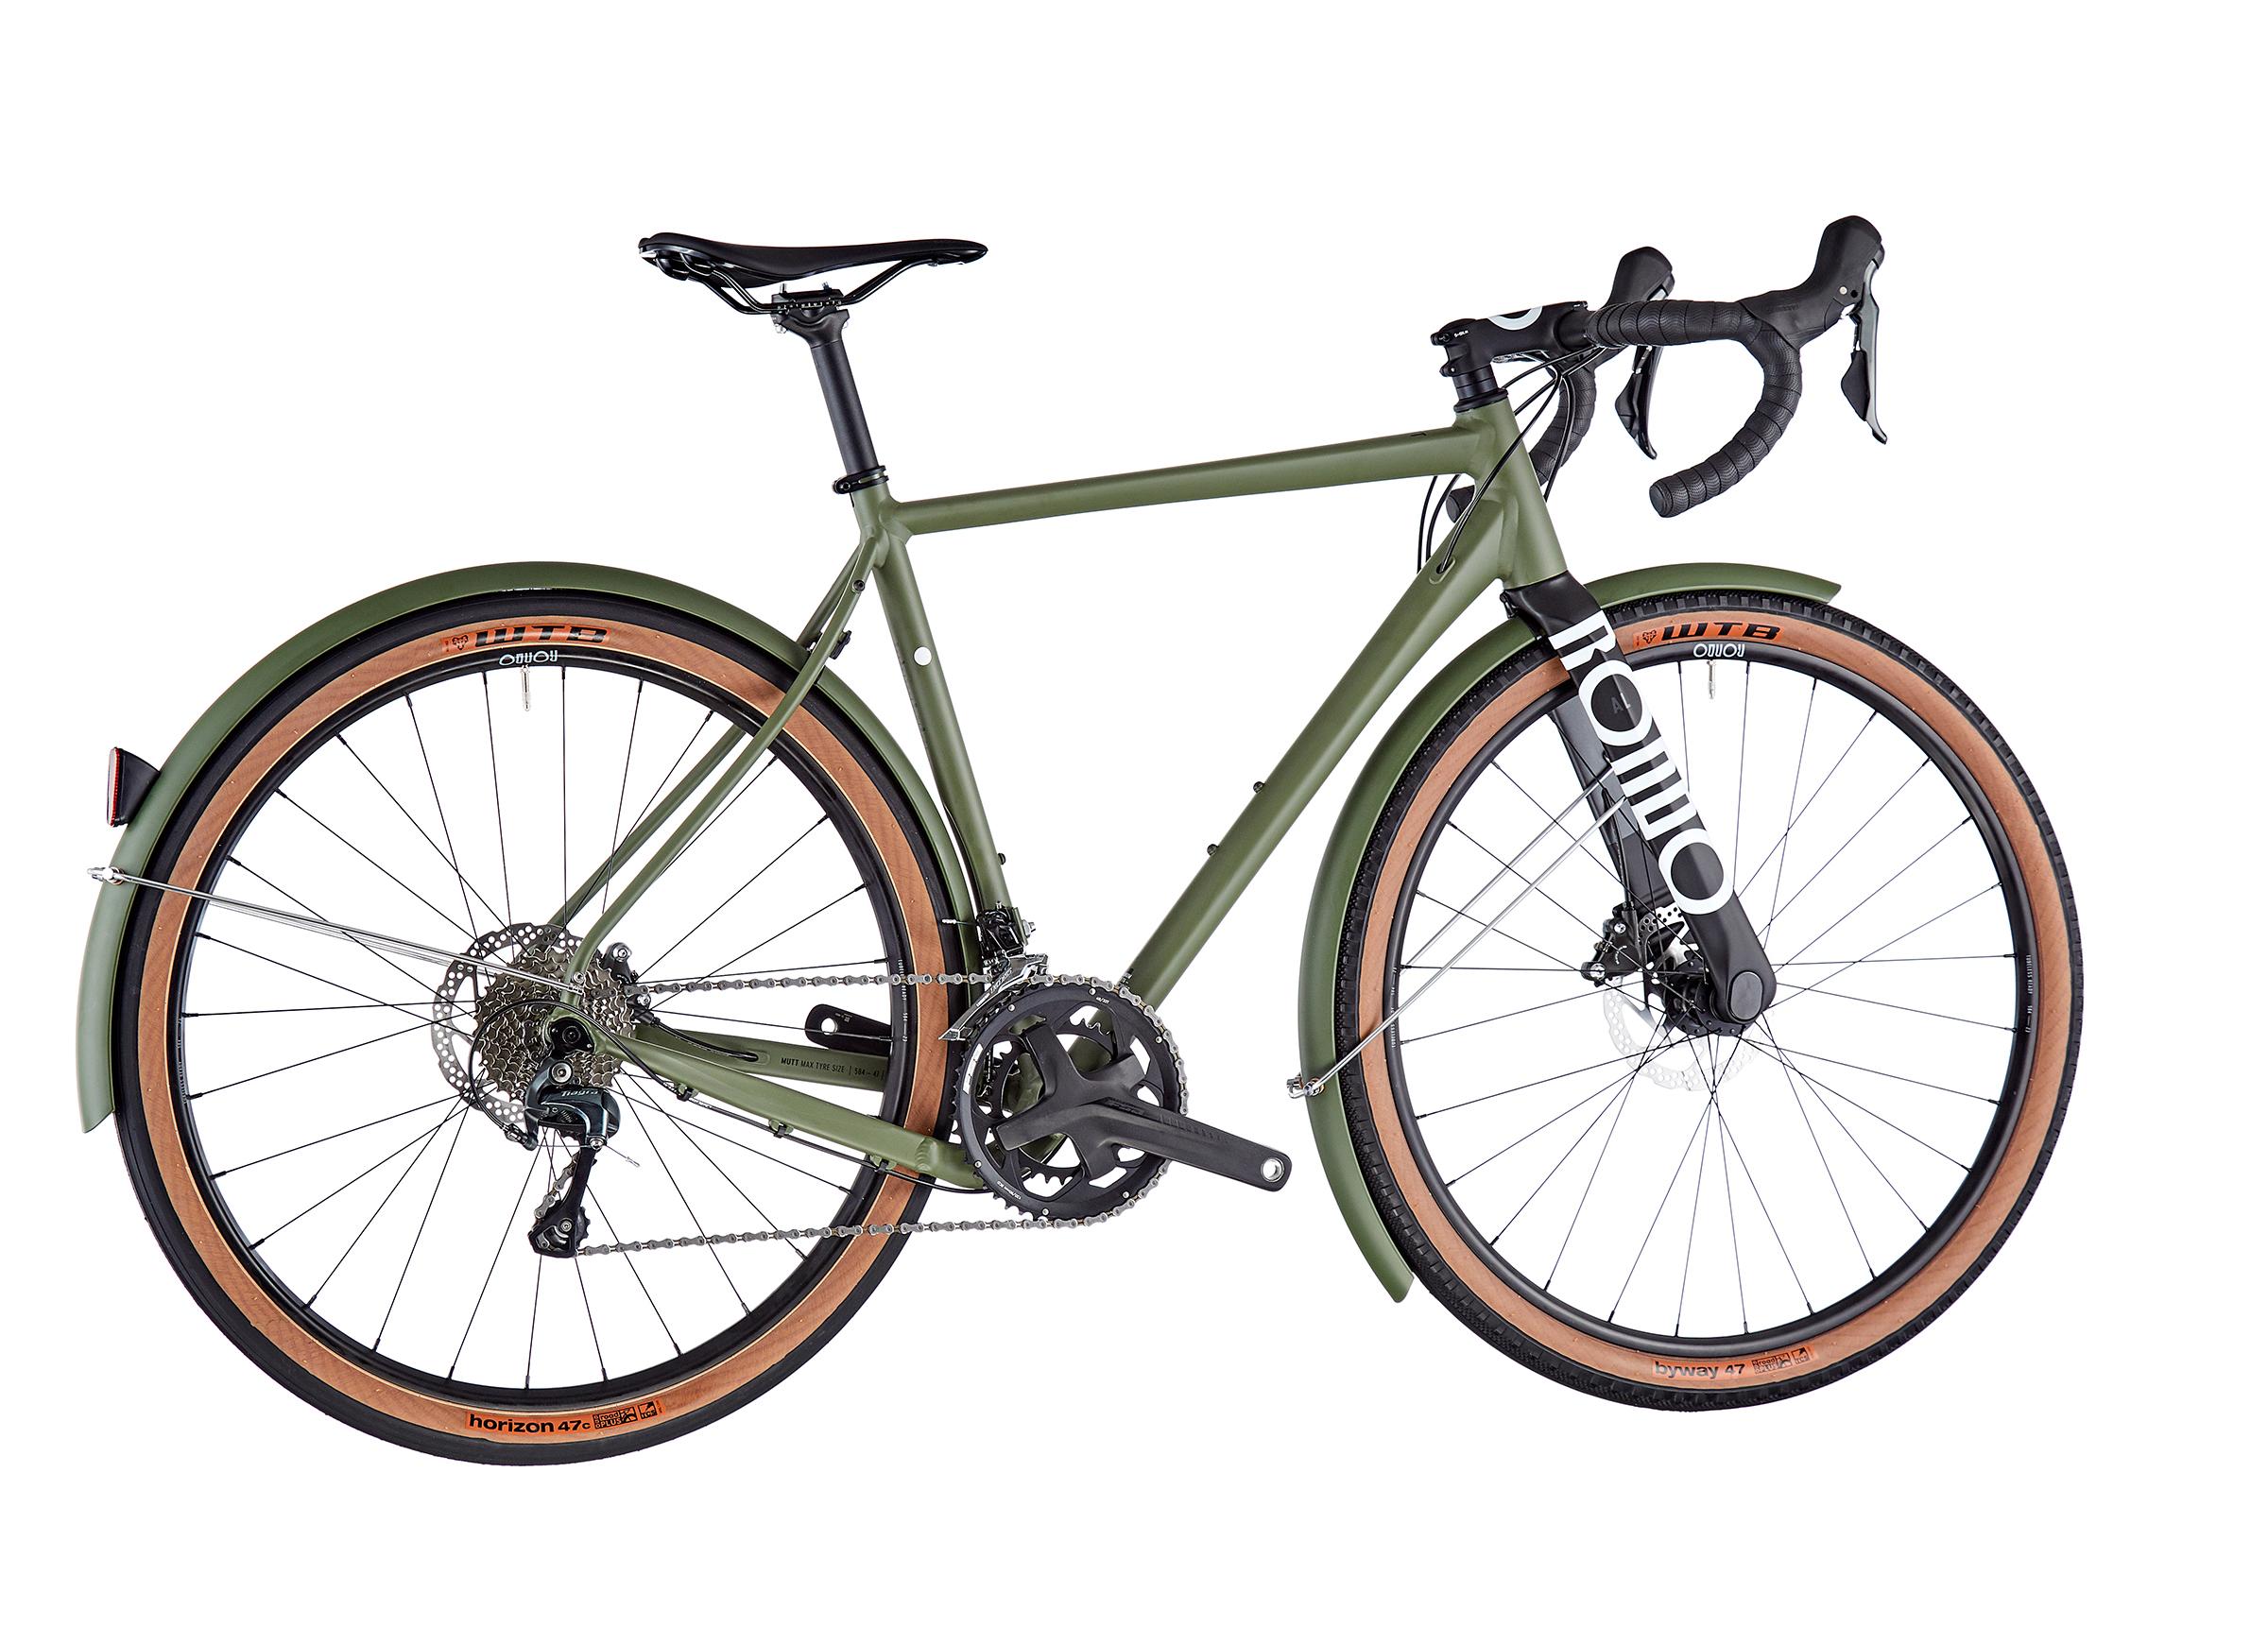 RONDO Mutt AL Audax Road Plus army green/black